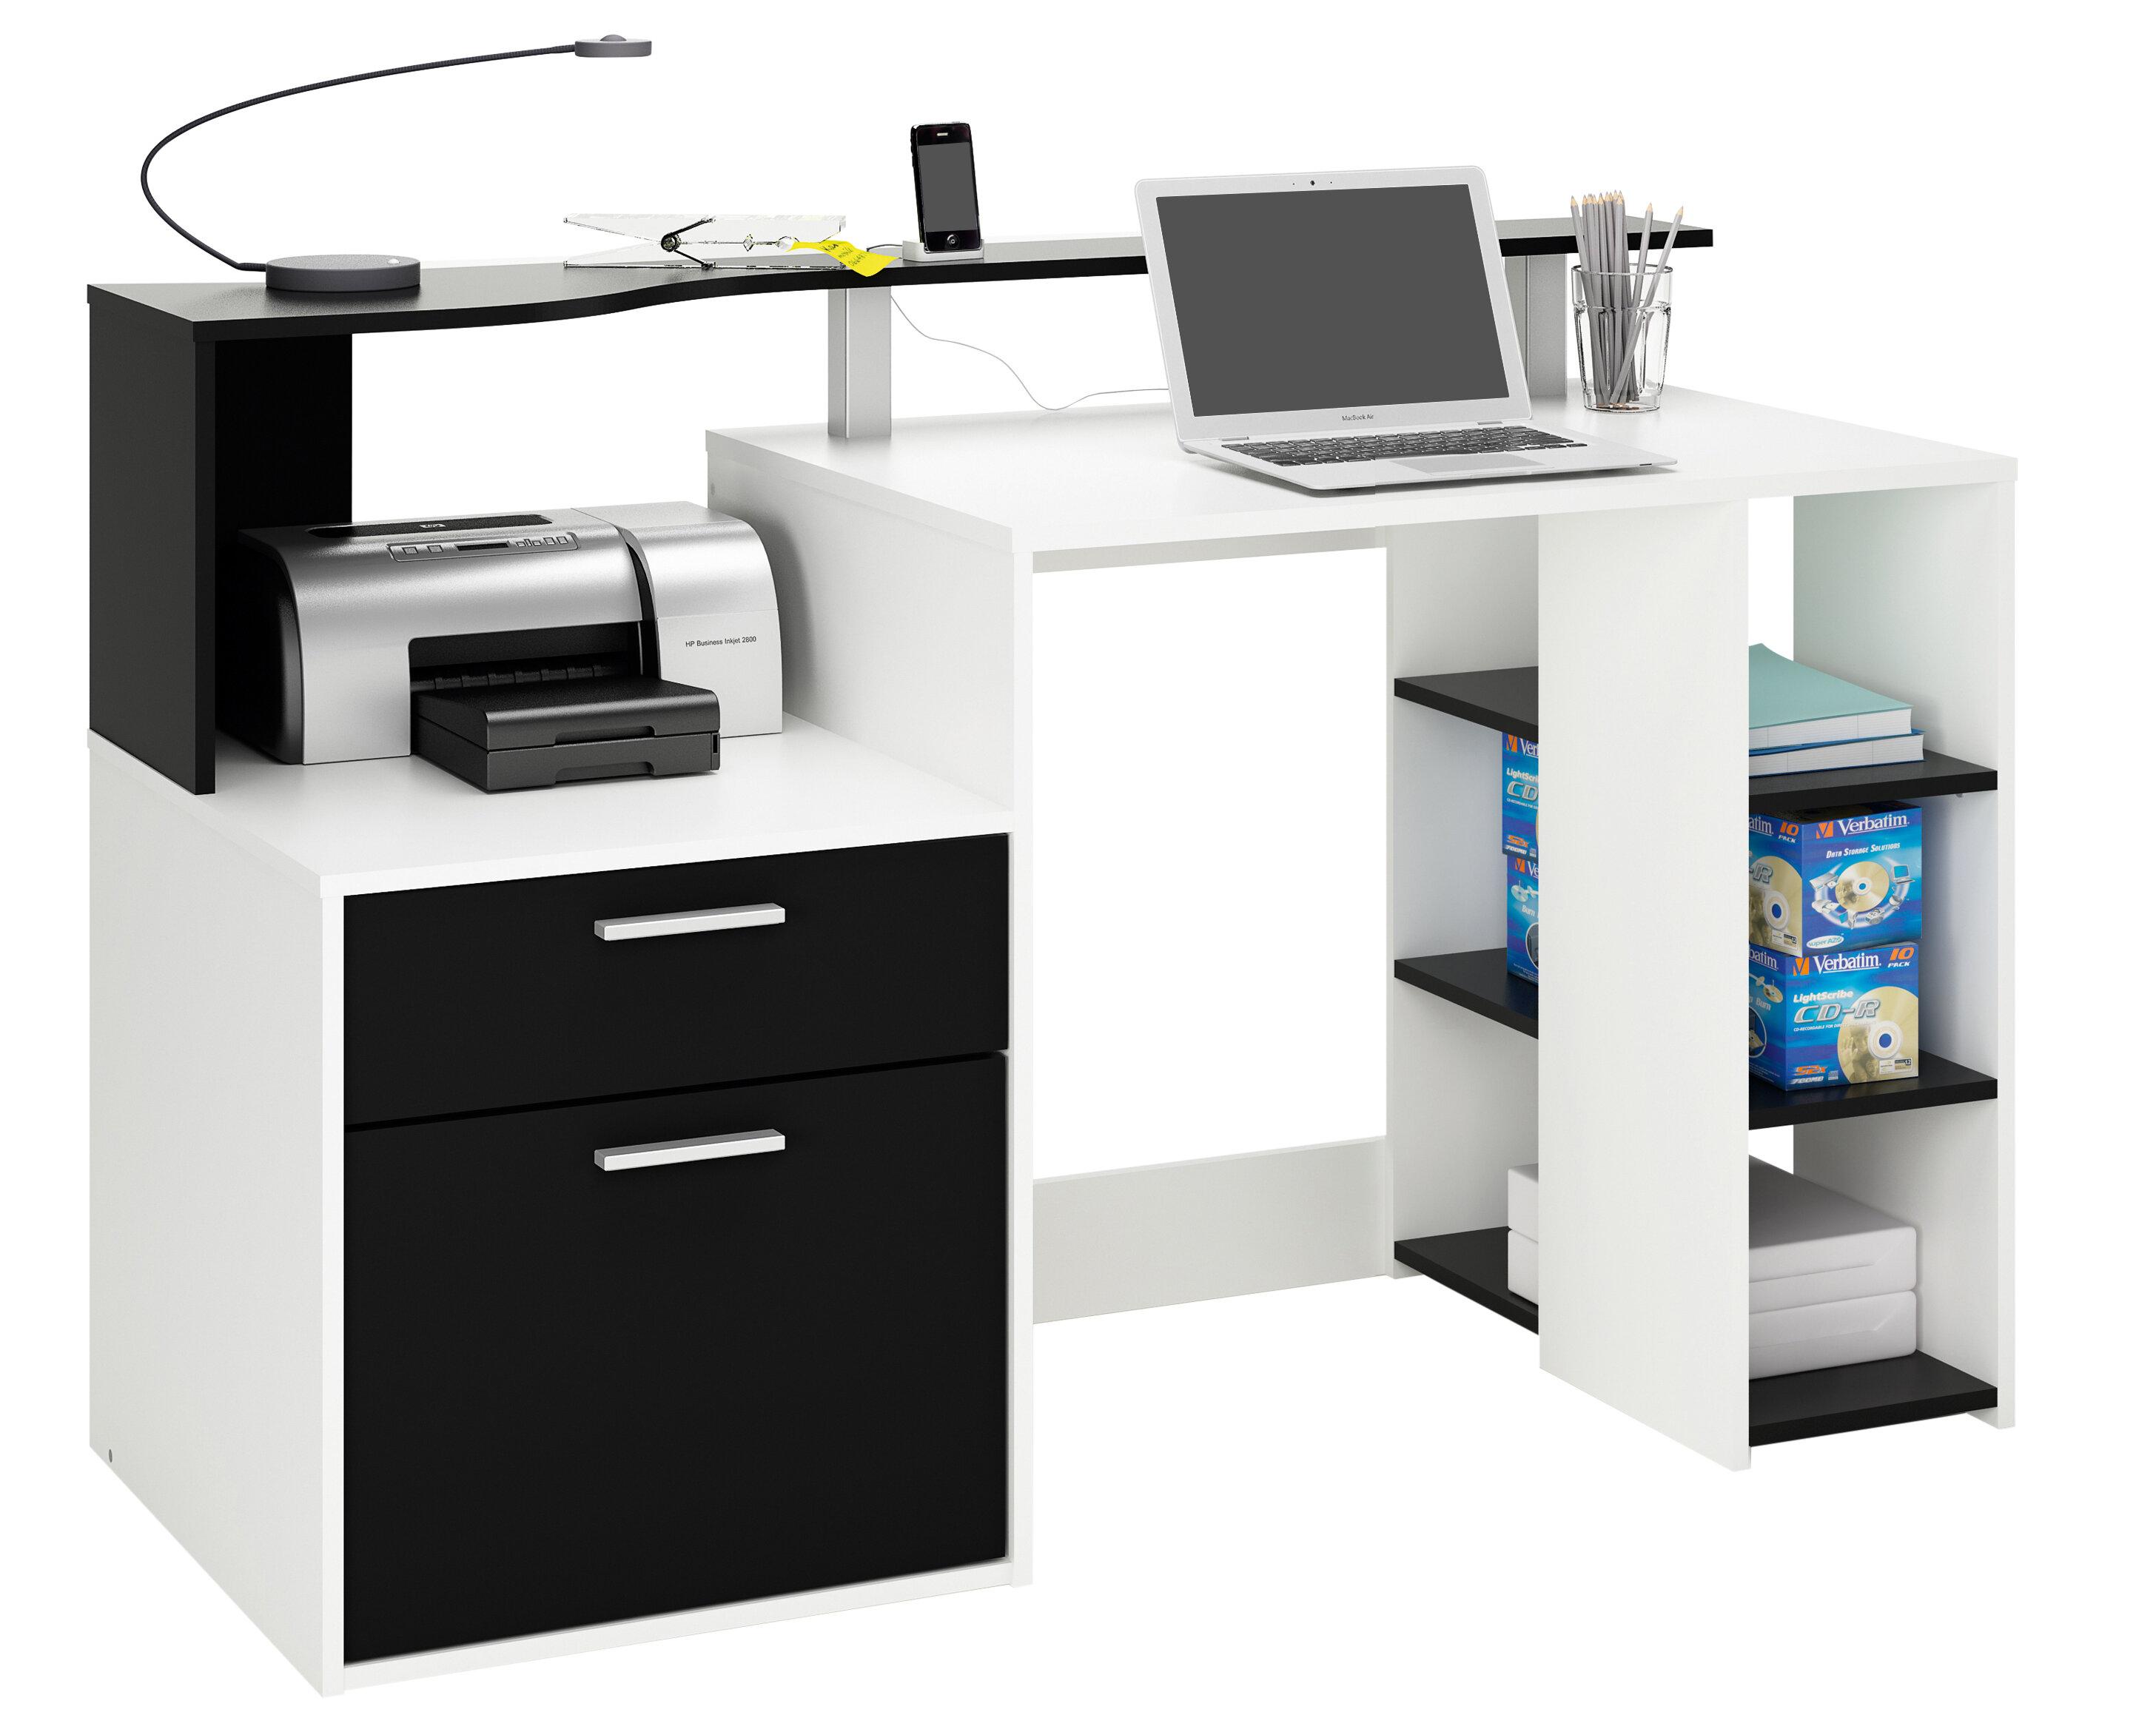 Home Etc Schreibtisch Mont U0026 Bewertungen   Wayfair.de